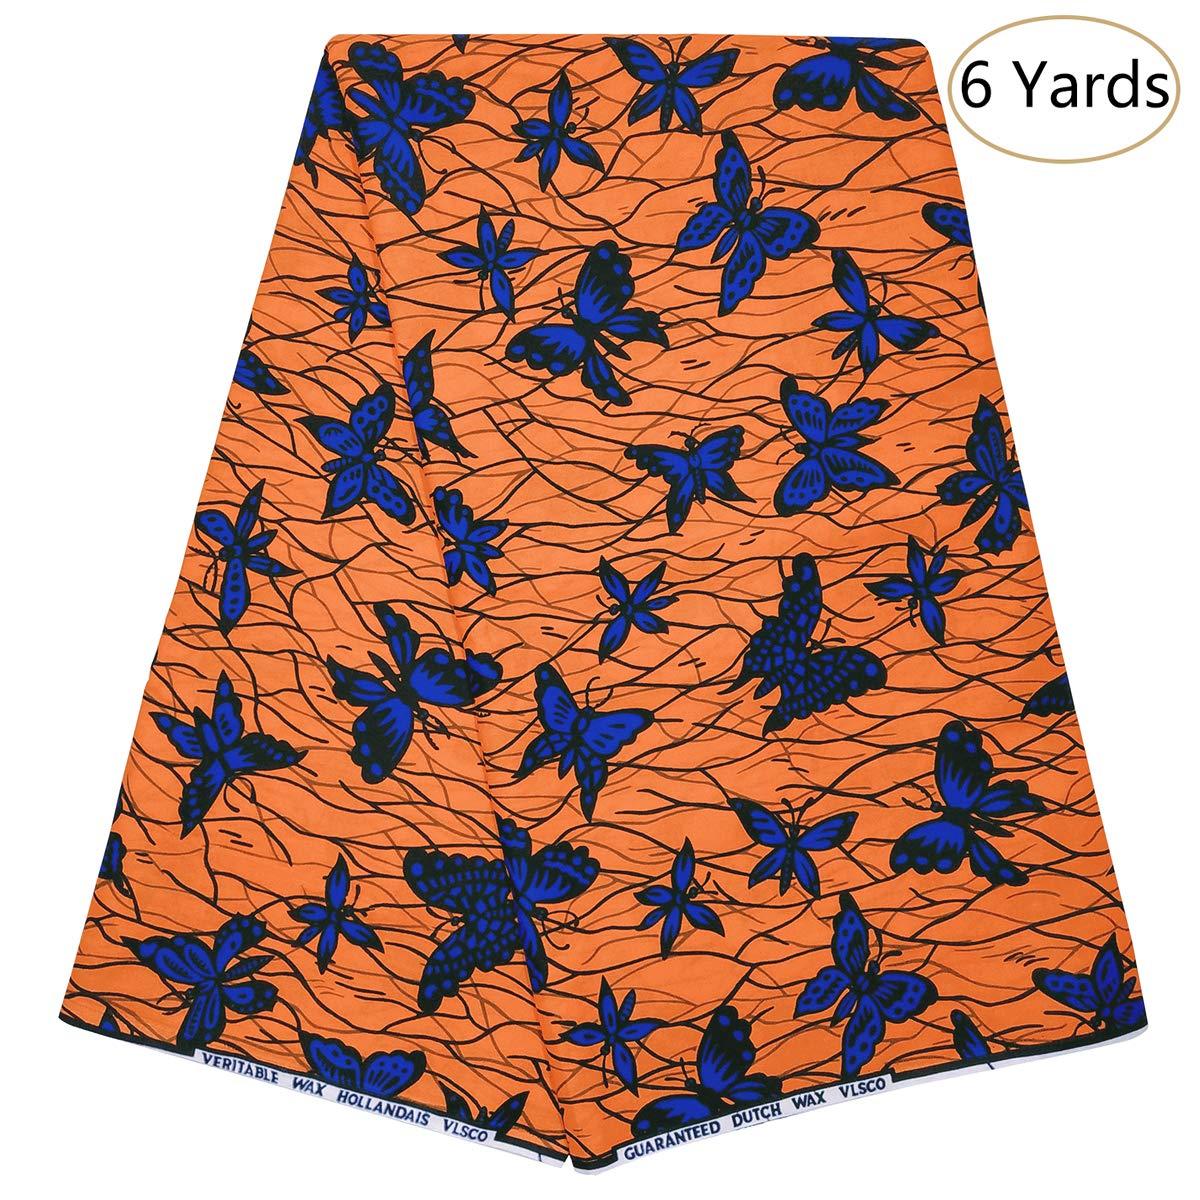 Dexuelan 6 Yards Ankara African Batik Wax Fabric 100% Cotton African Super Wax Print Fabric for Sewing Dress Clothing